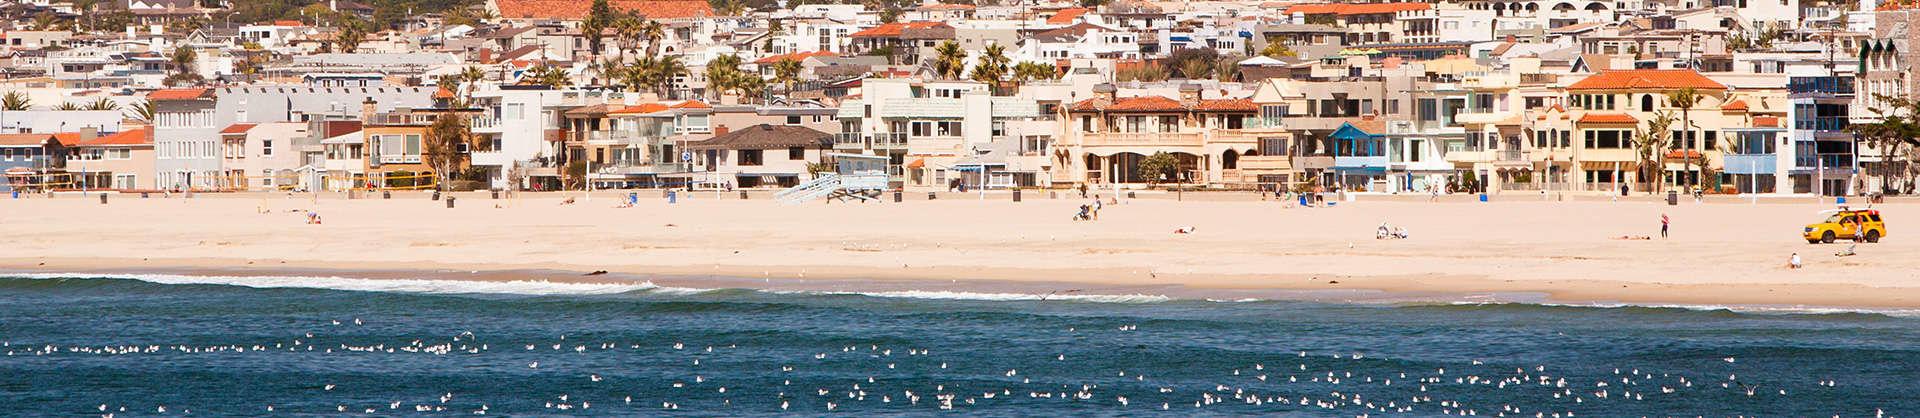 Santa Monica Beach in Los Angeles